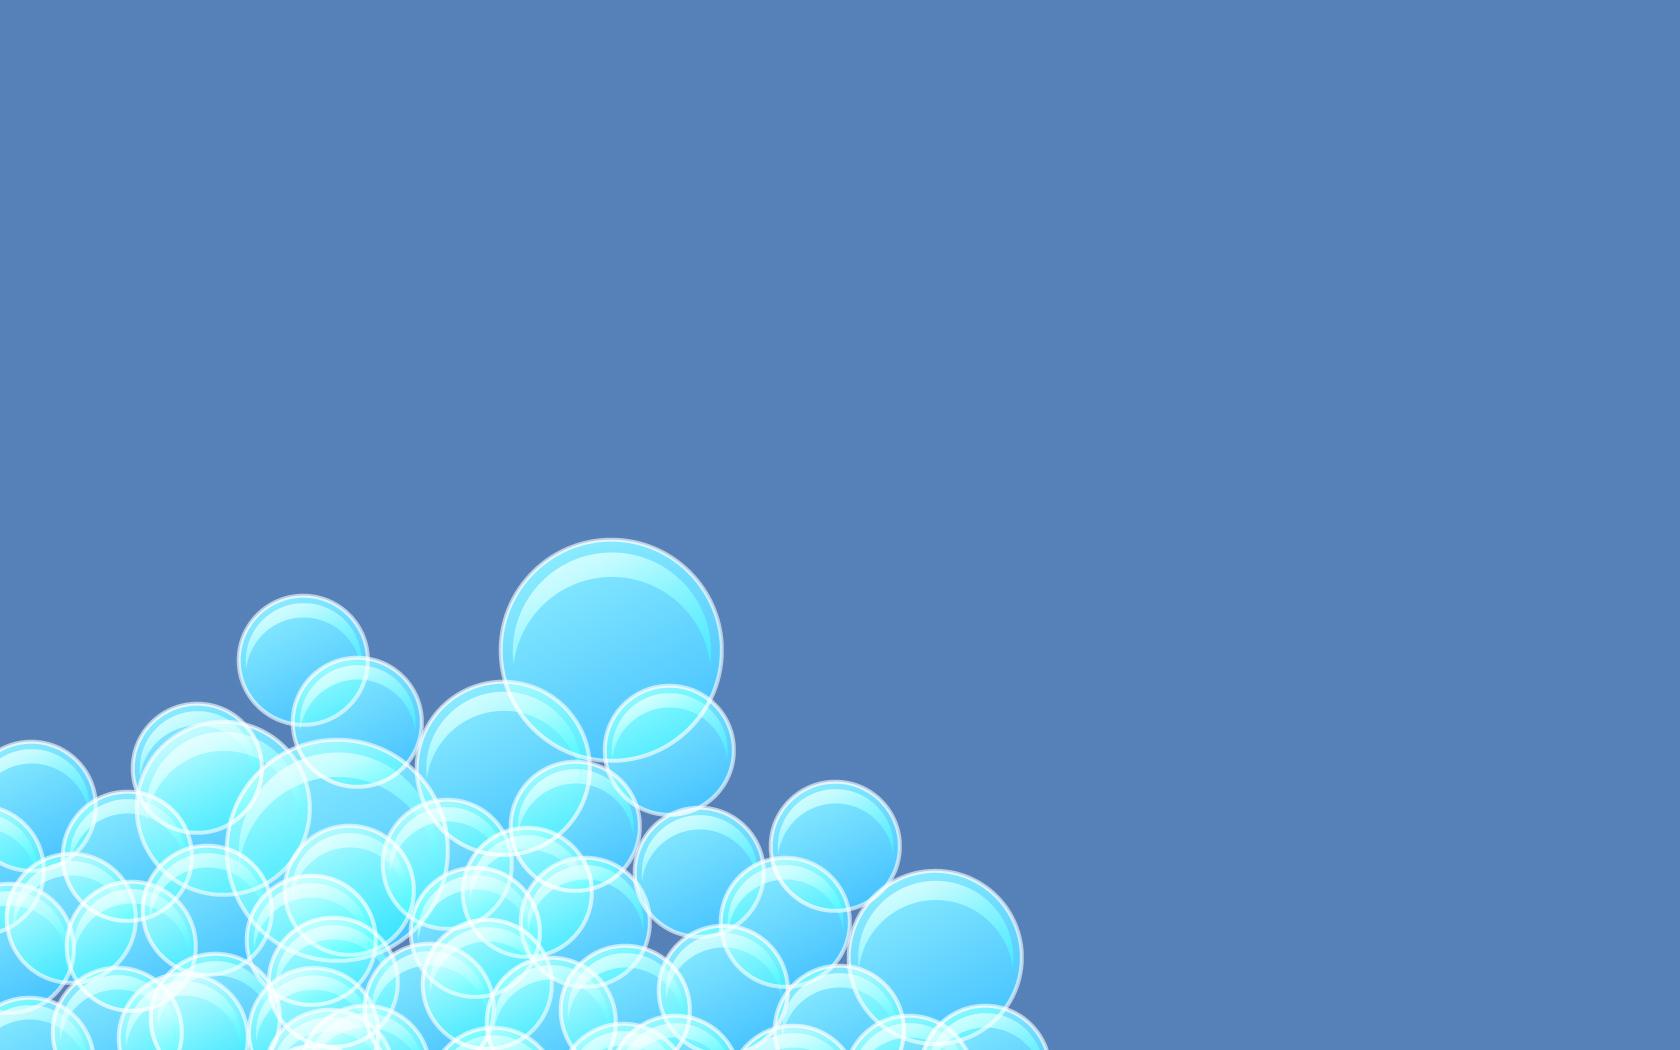 Bubbles Animated Wallpaper - WallpaperSafari